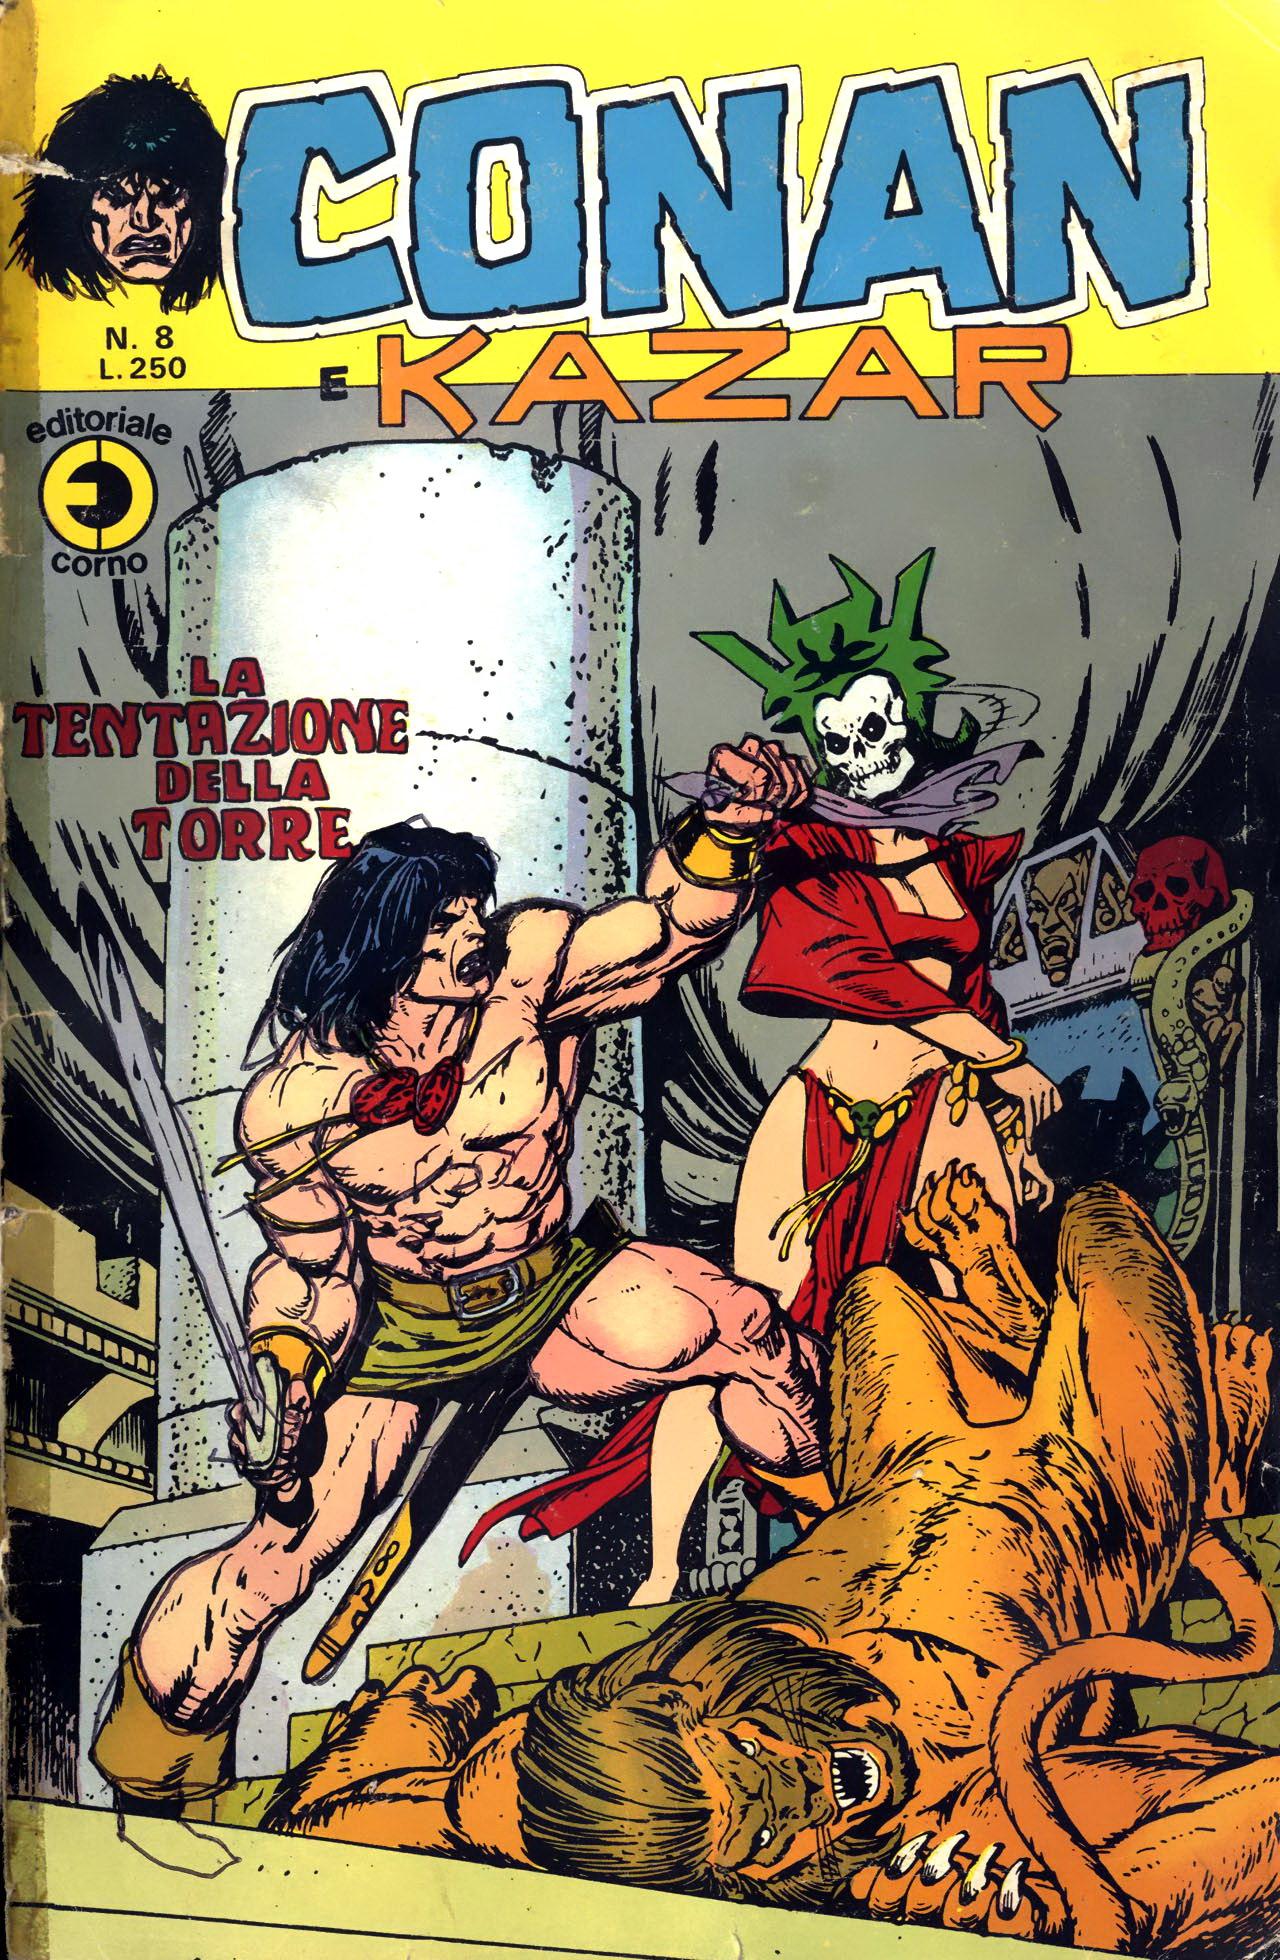 Conan e Ka-zar n. 8